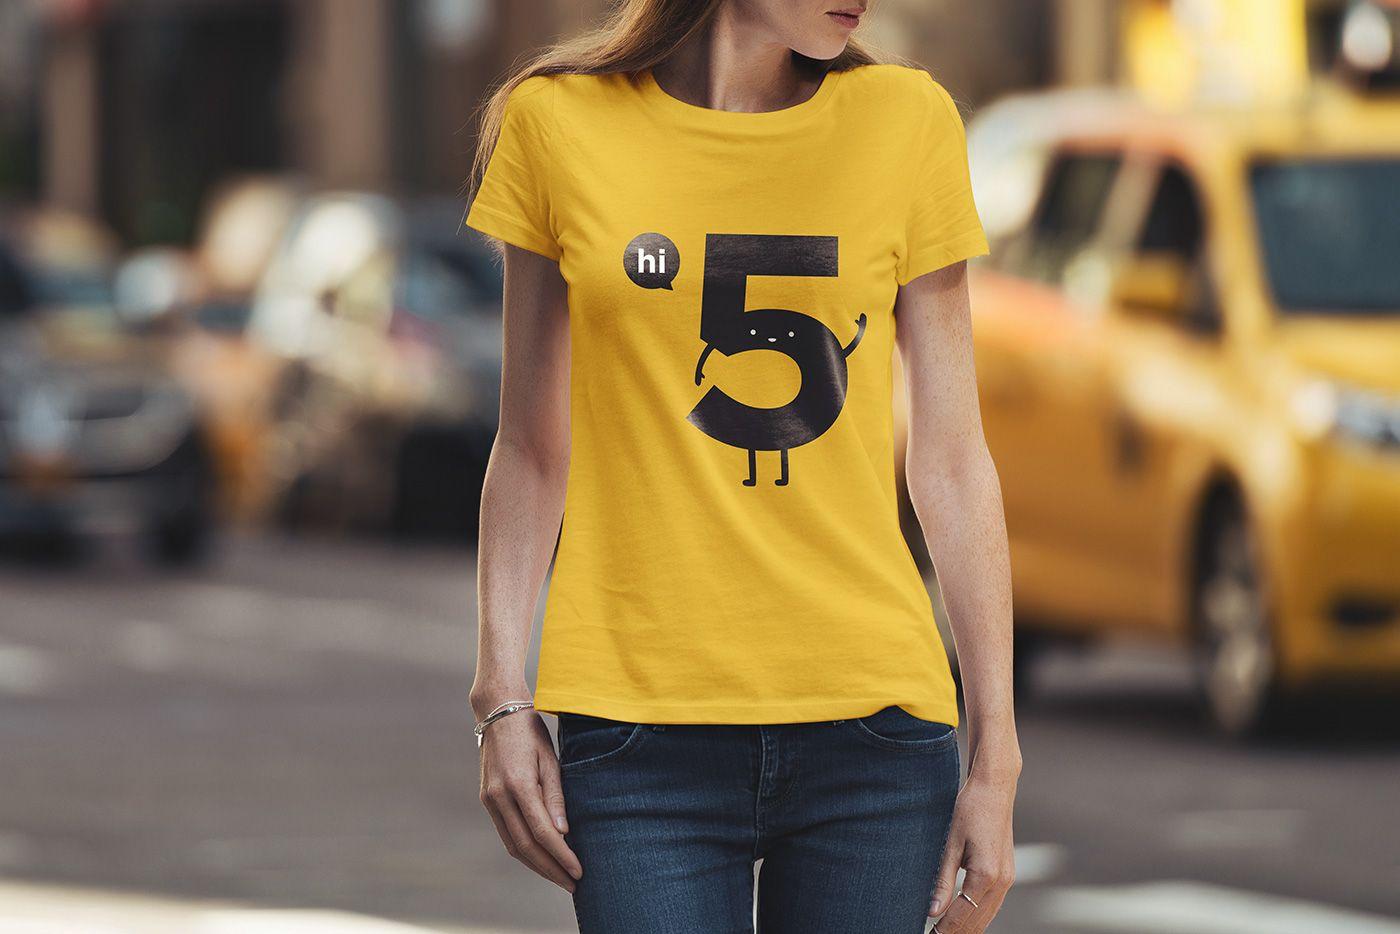 Download T Shirt Mockup Urban Edition Vol 2 On Behance Shirt Mockup T Shirt Design Template Tshirt Mockup